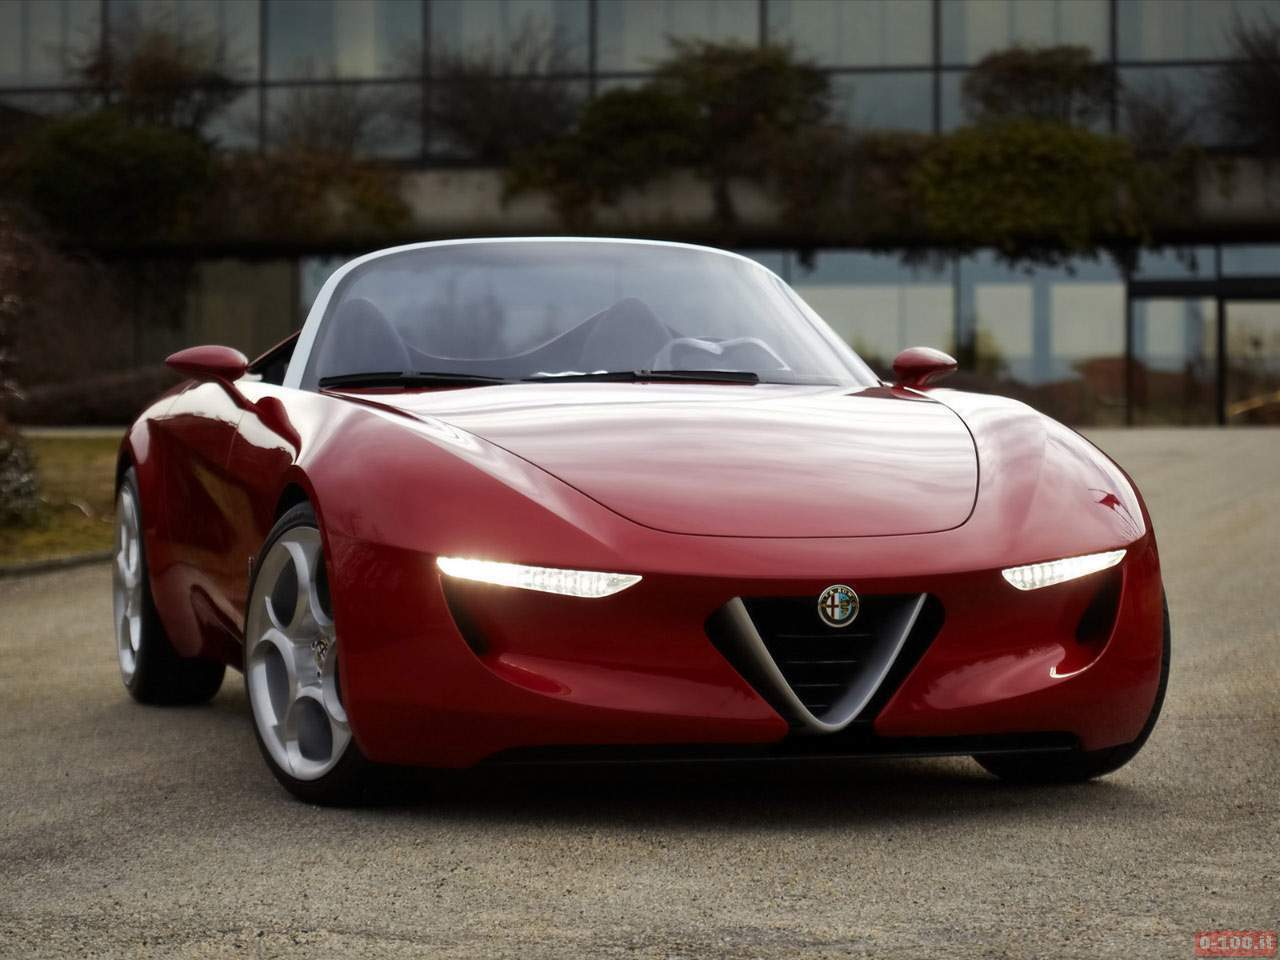 Alfa_Romeo-2uettottanta-2011_01-100_2